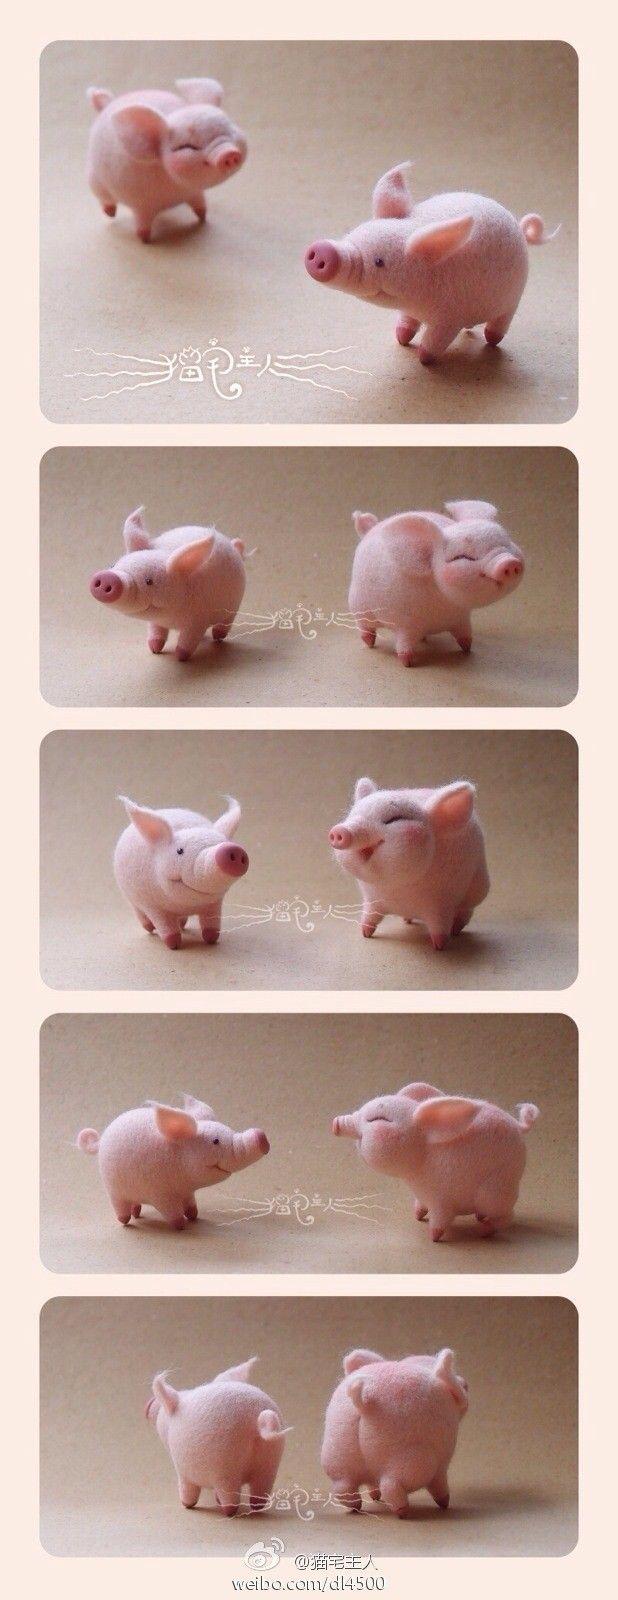 Wool Felt Pig